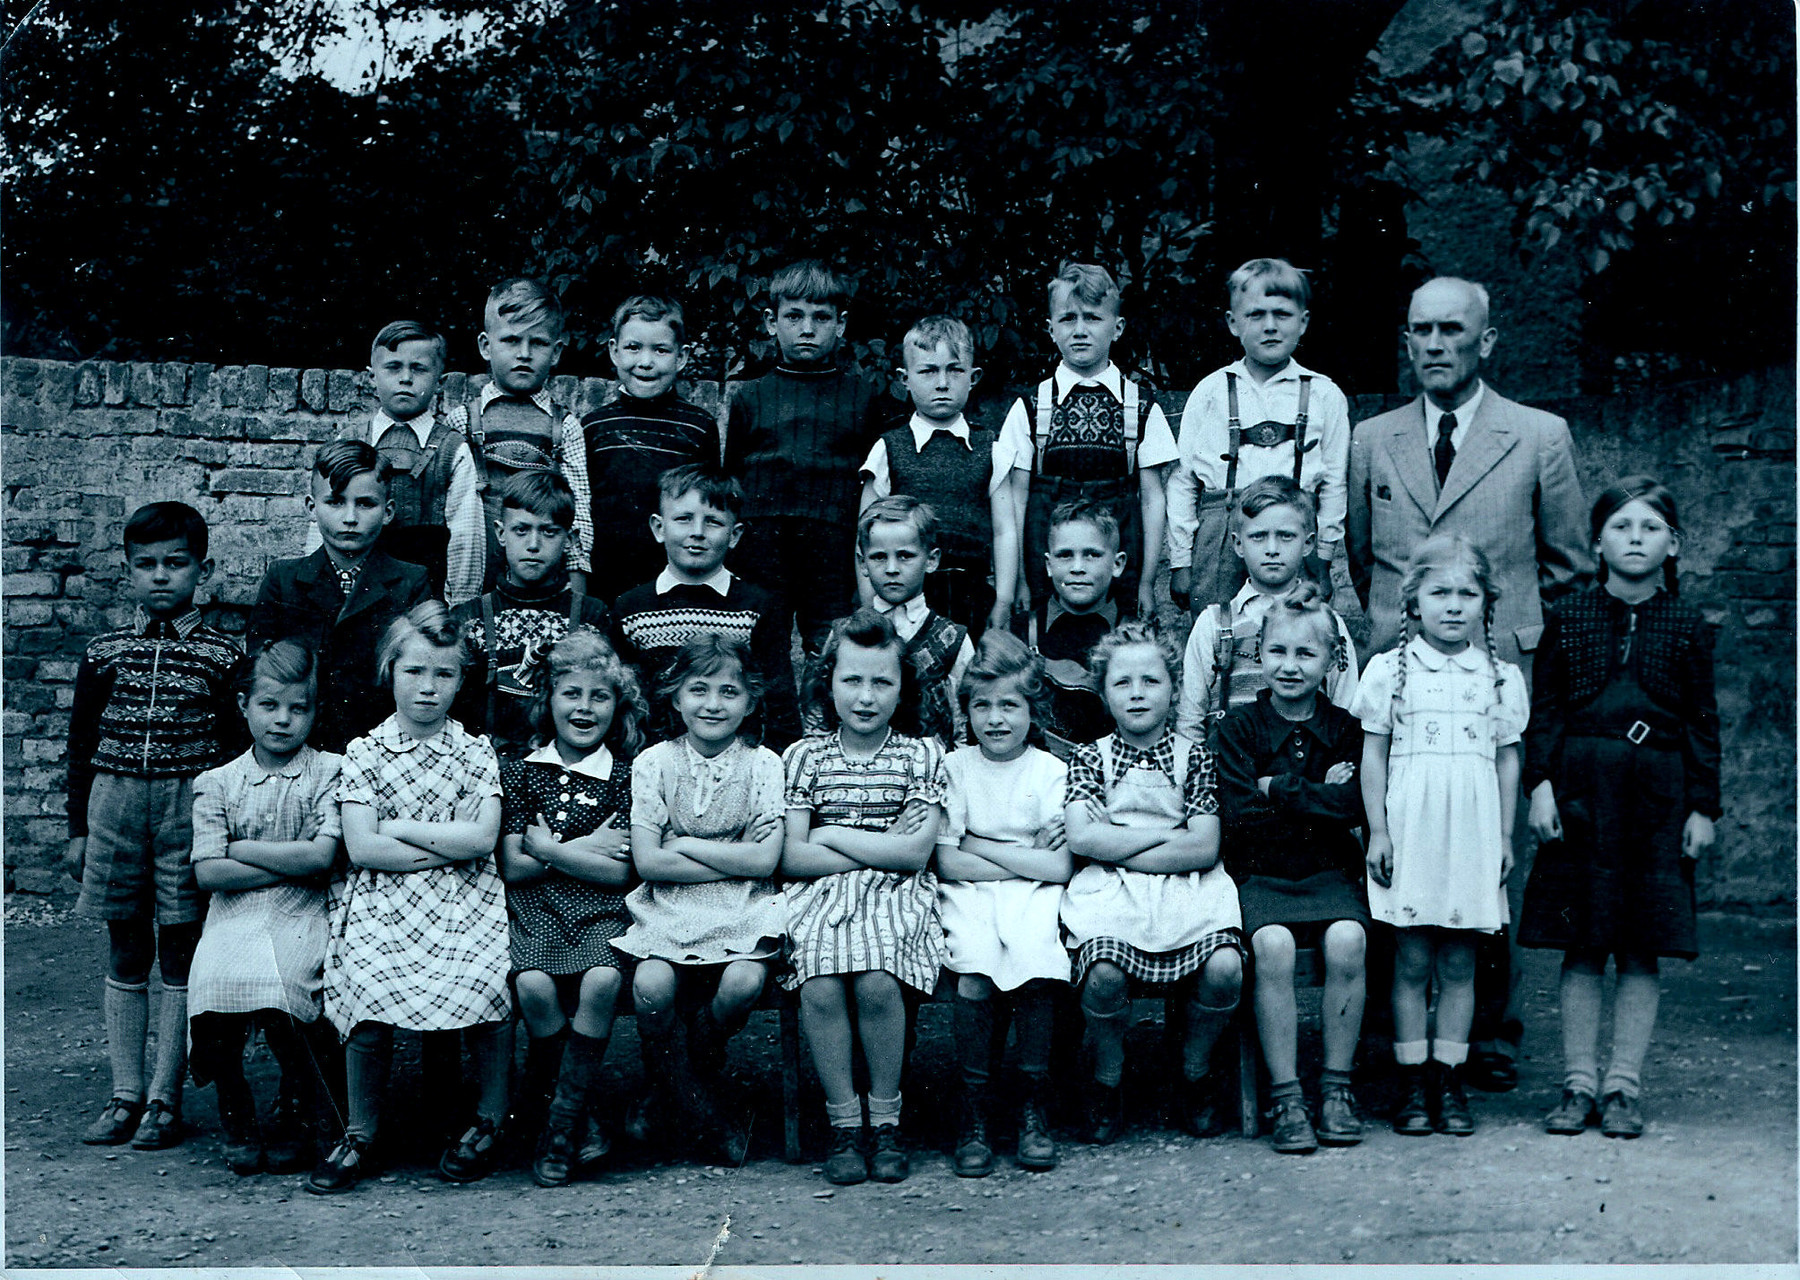 Jahrgang 1943, Bild:Hofmann